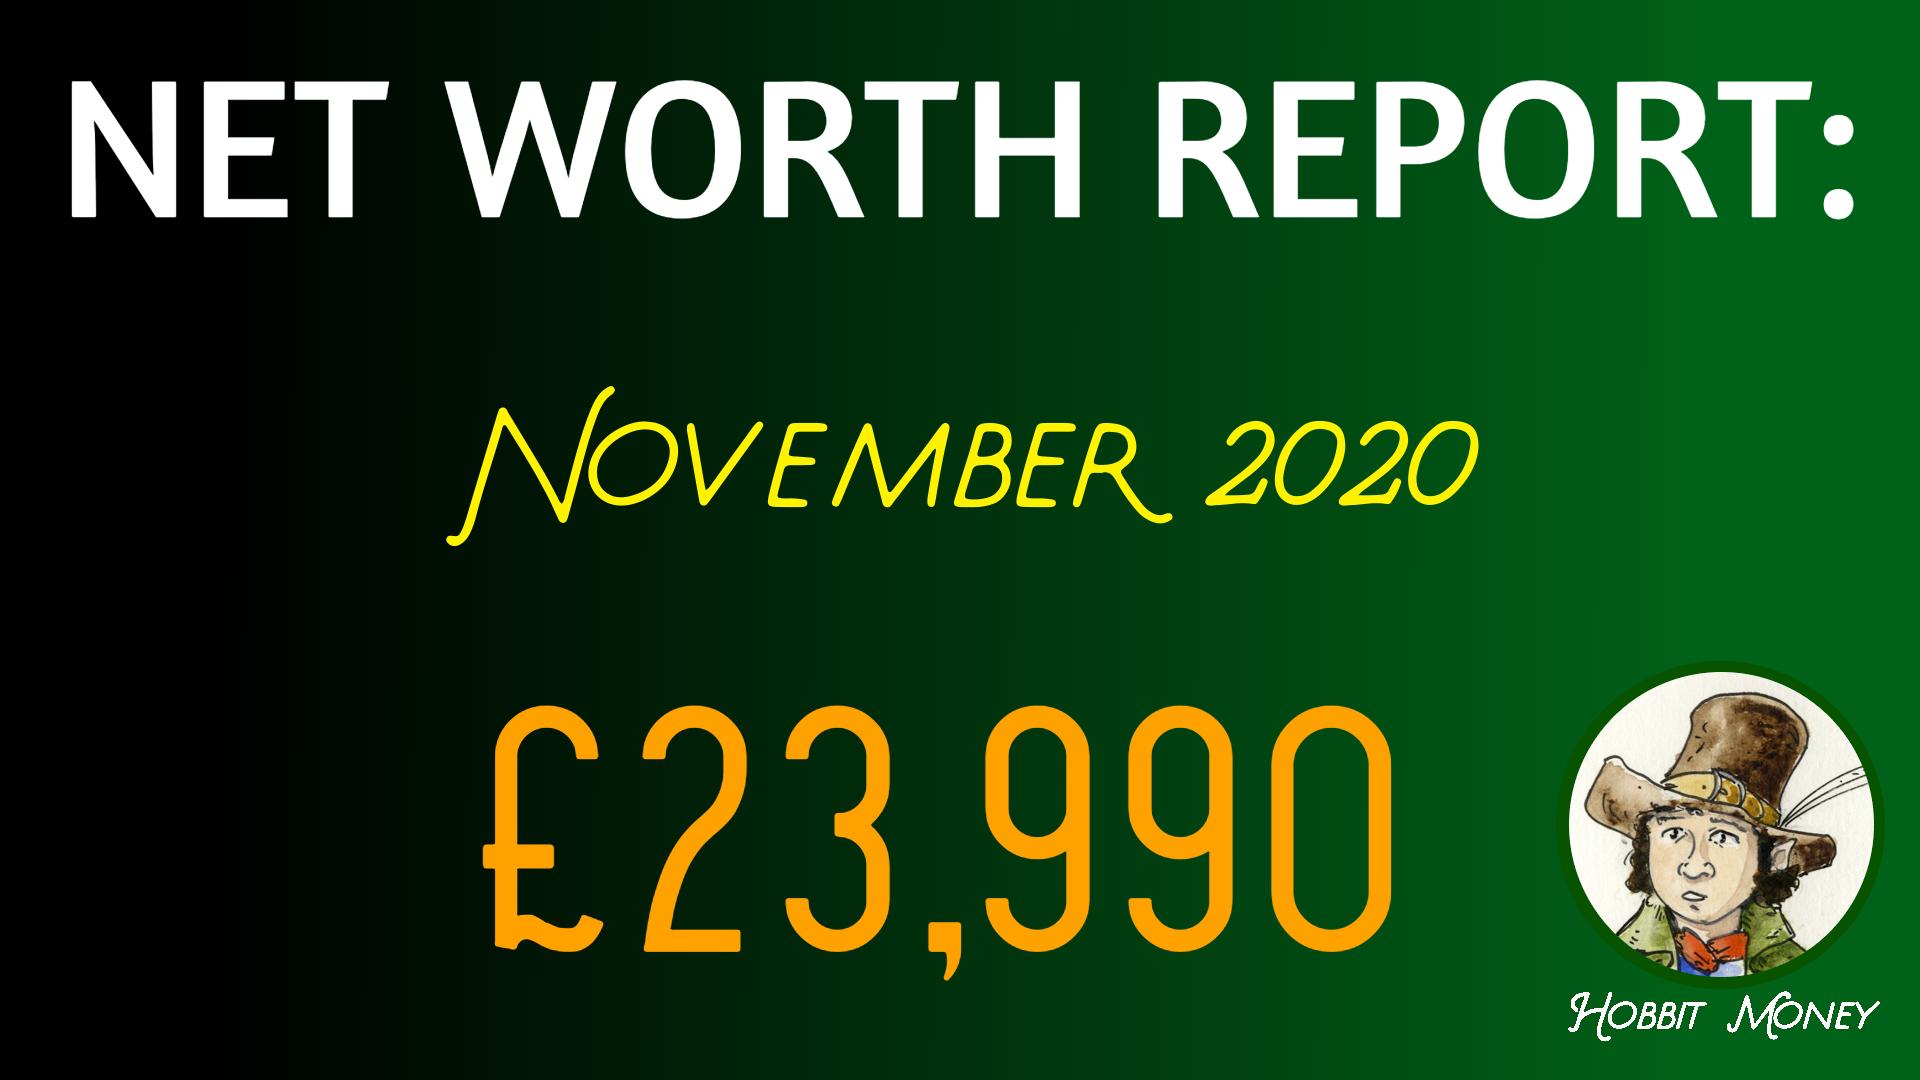 NET WORTH REPORT NOVEMBER 2020: £23,990 - Hobbit Money